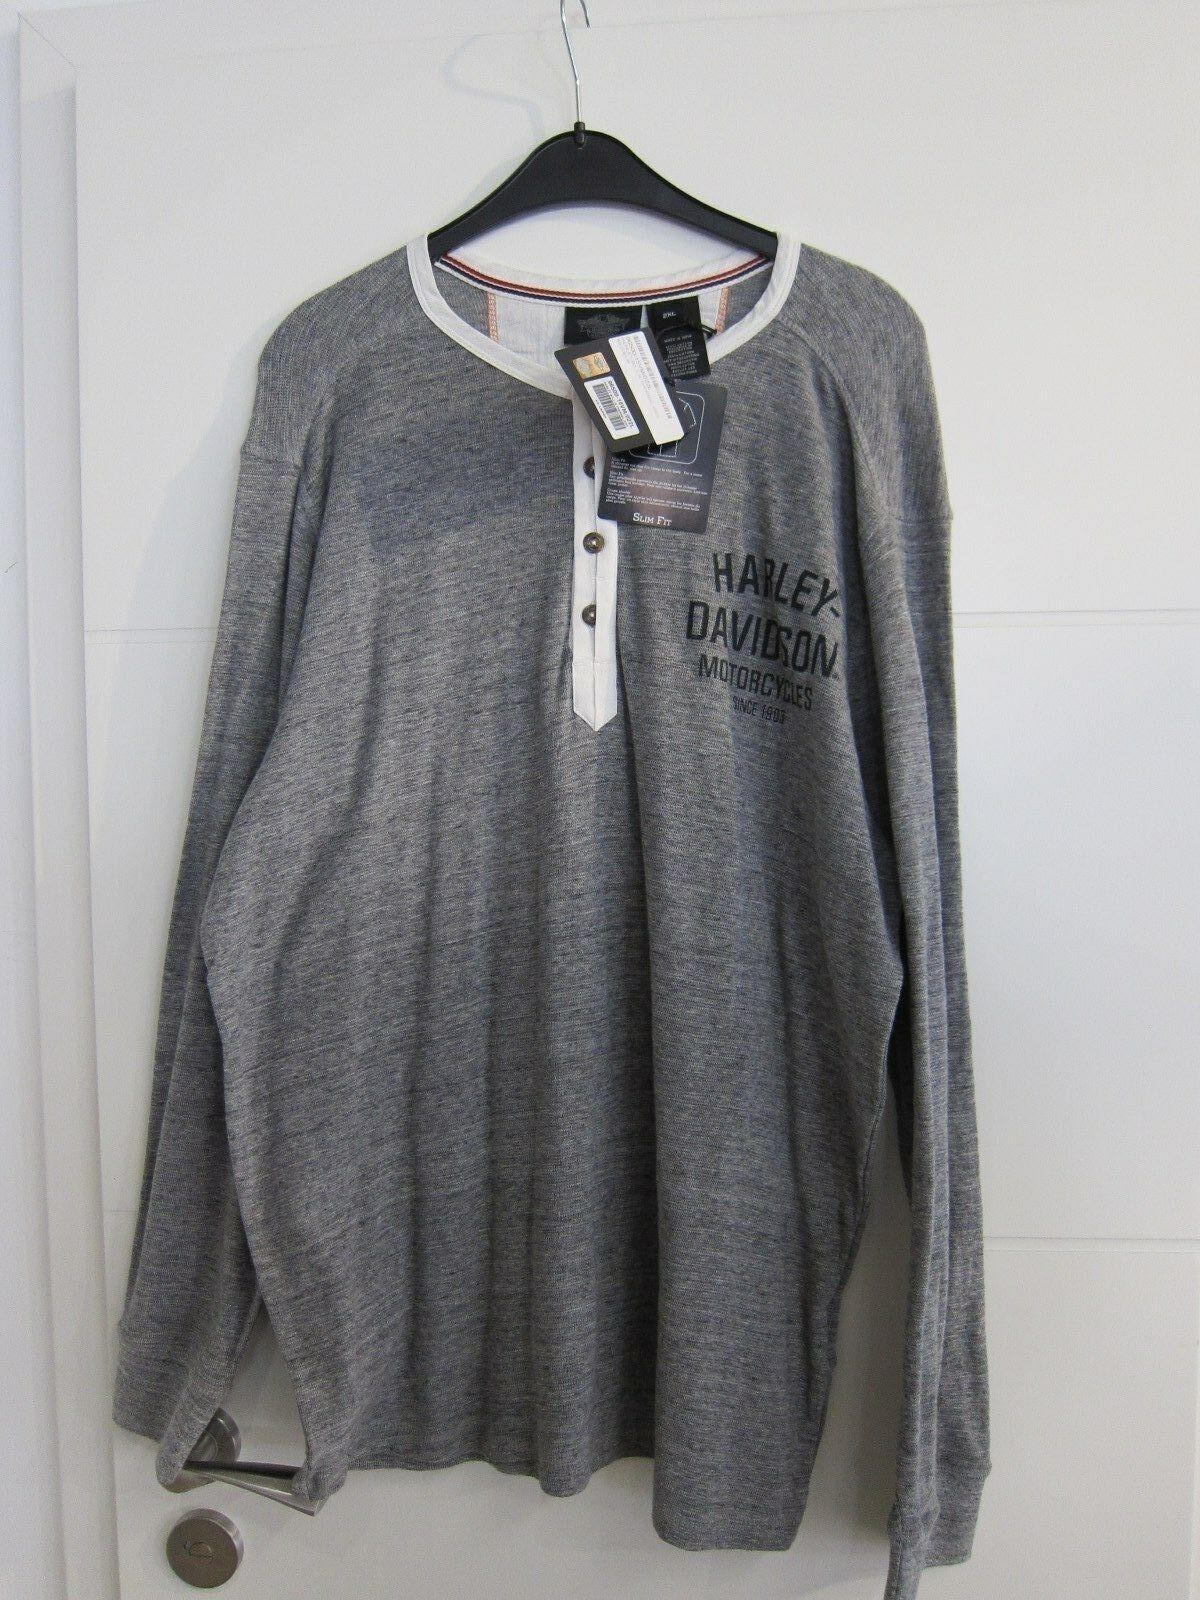 HARLEY-DAVIDSON Manica Lunga Slim Fit 96500-15vm THERMAL SHIRT SHIRT SHIRT grigio TG. XXL f0a742